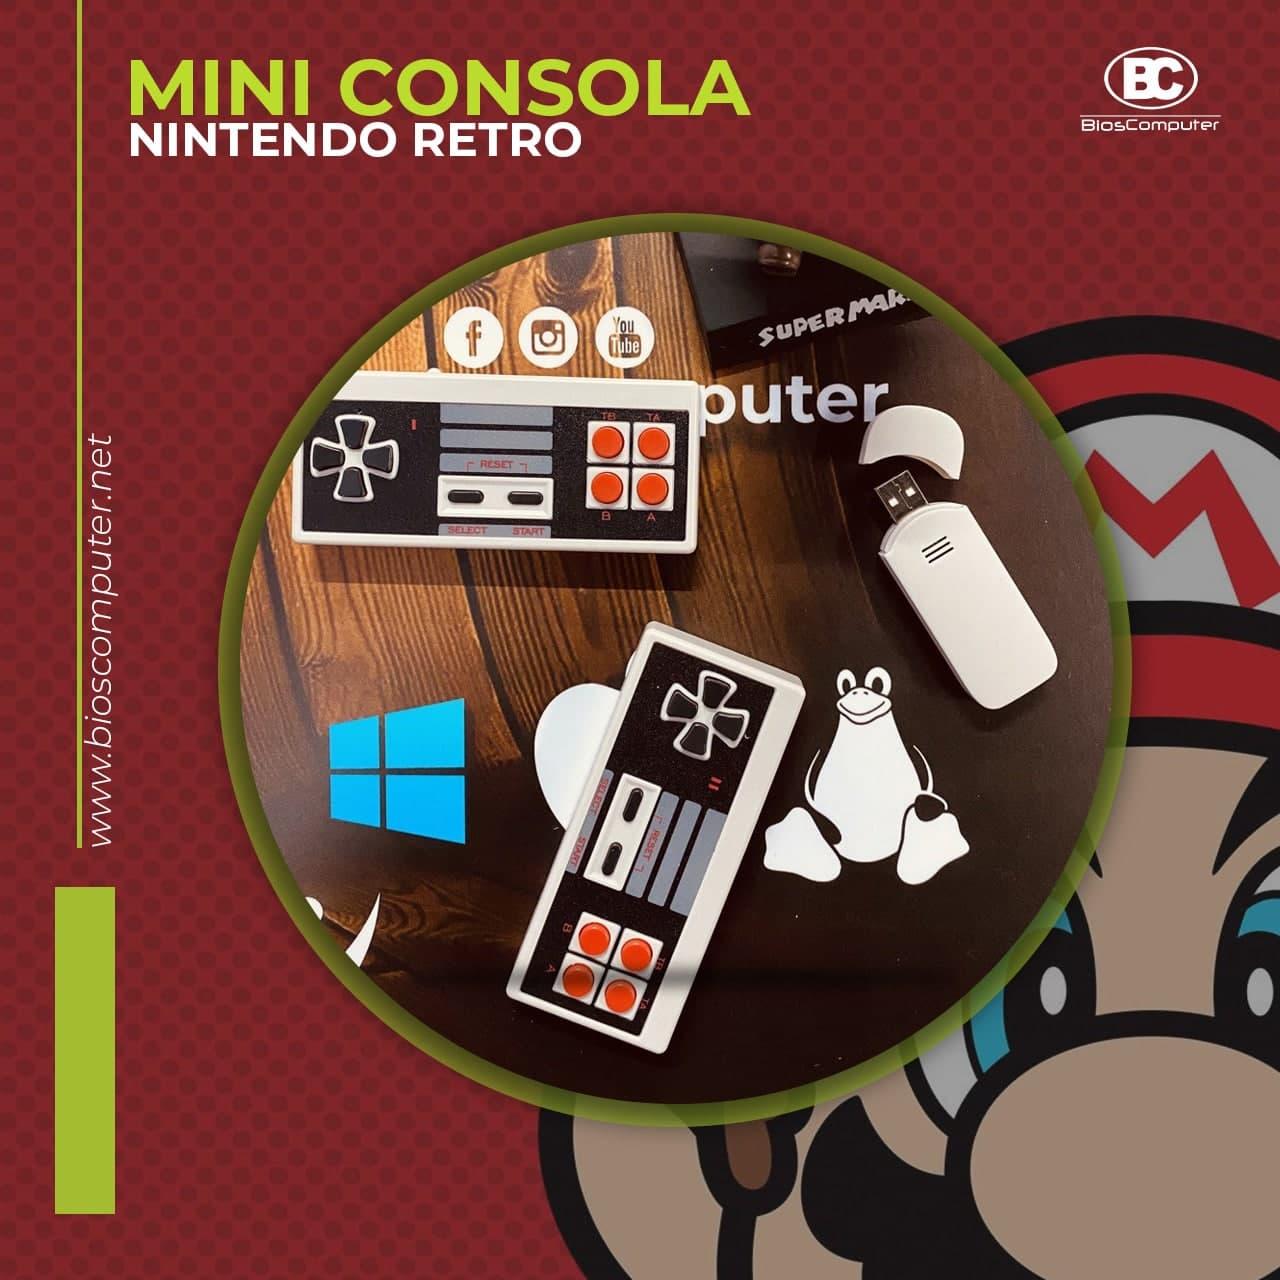 MINI CONSOLA 8BITS